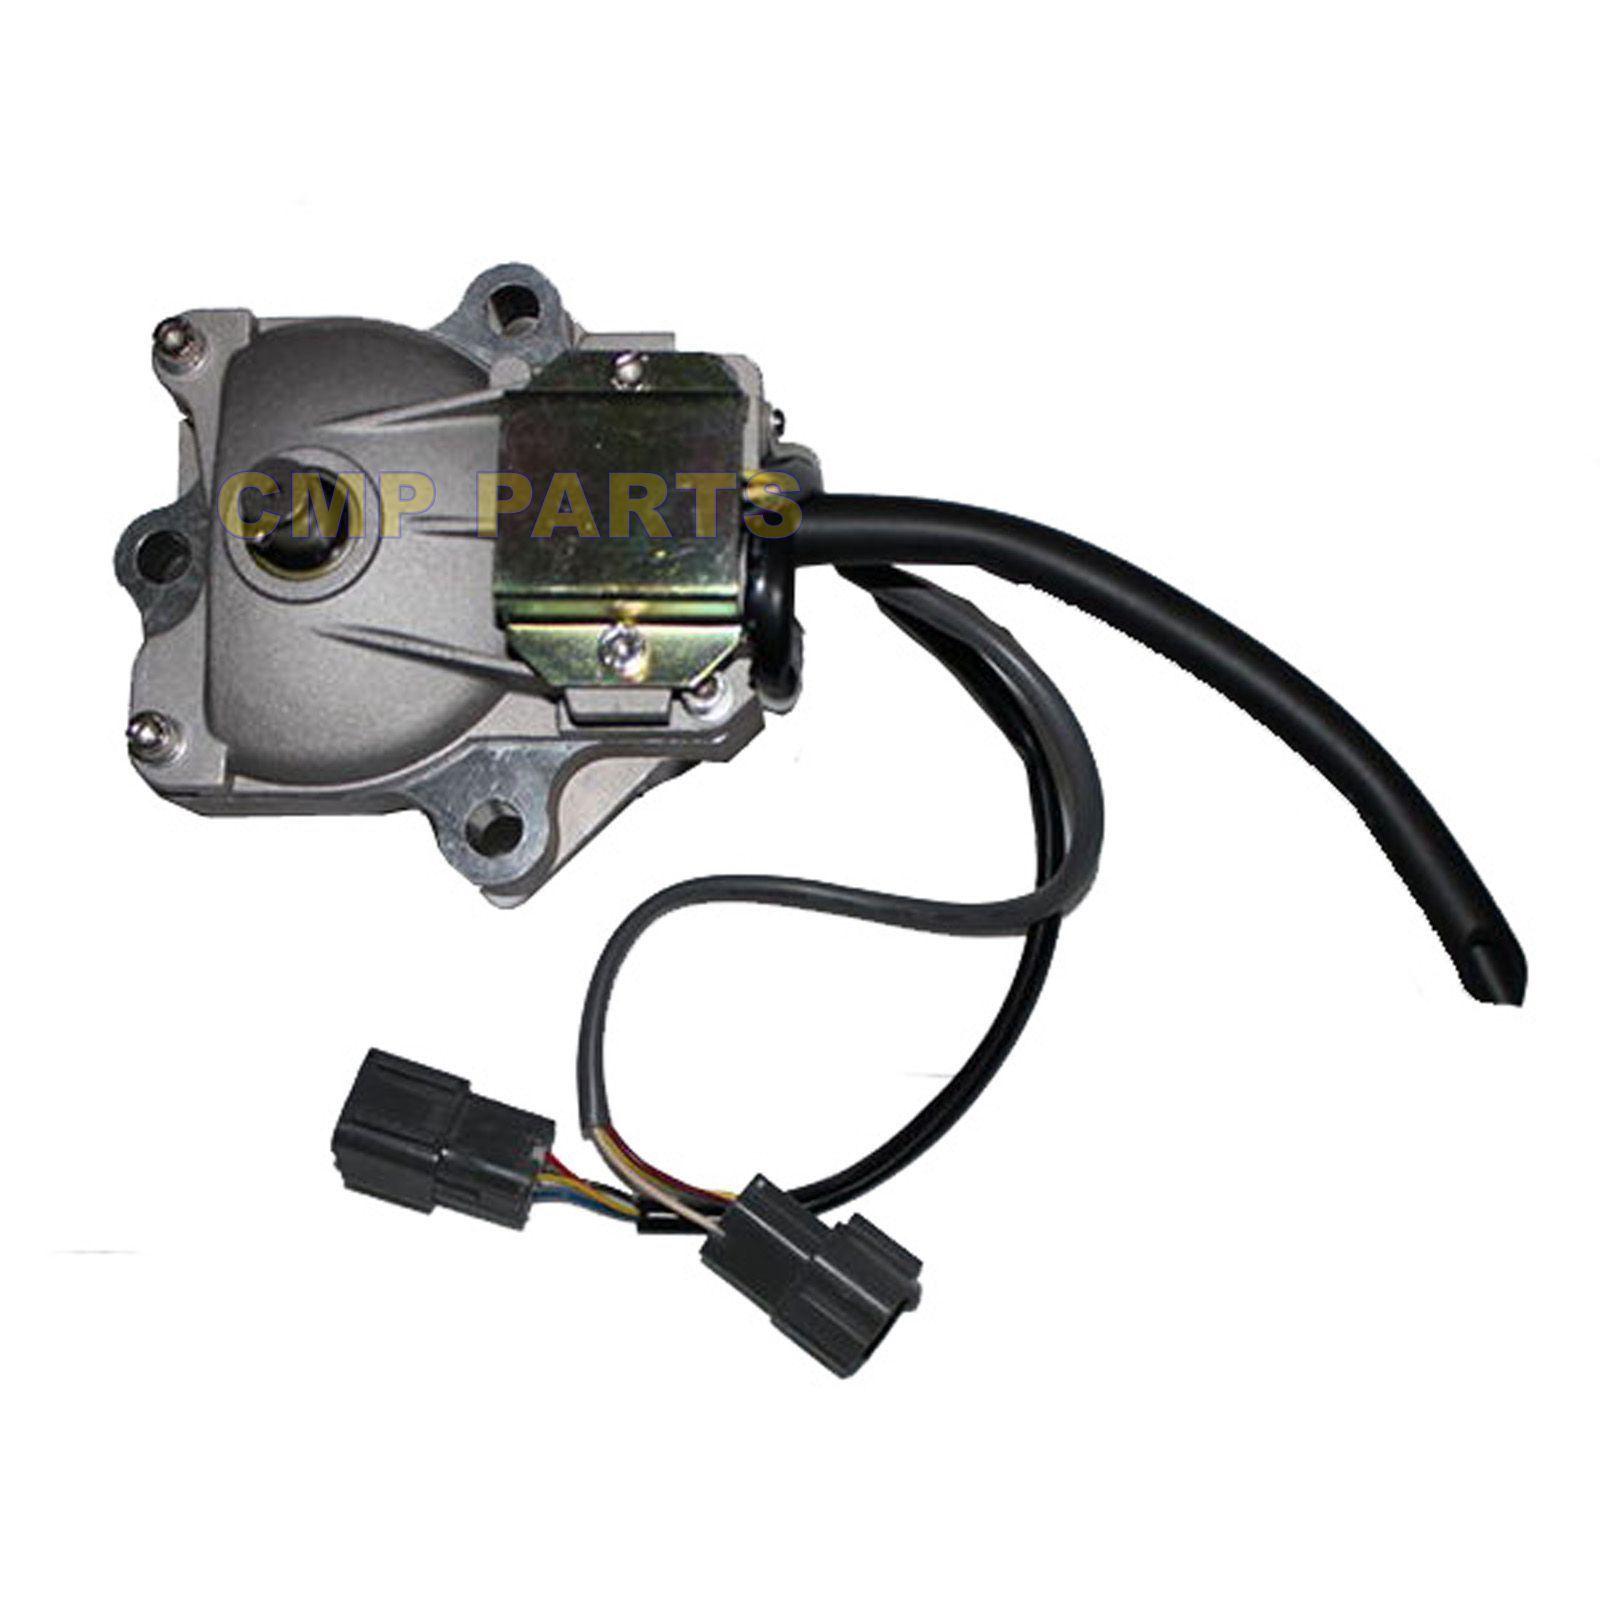 Throttle Motor 7834-40-3002 for Komatsu and 50 similar items